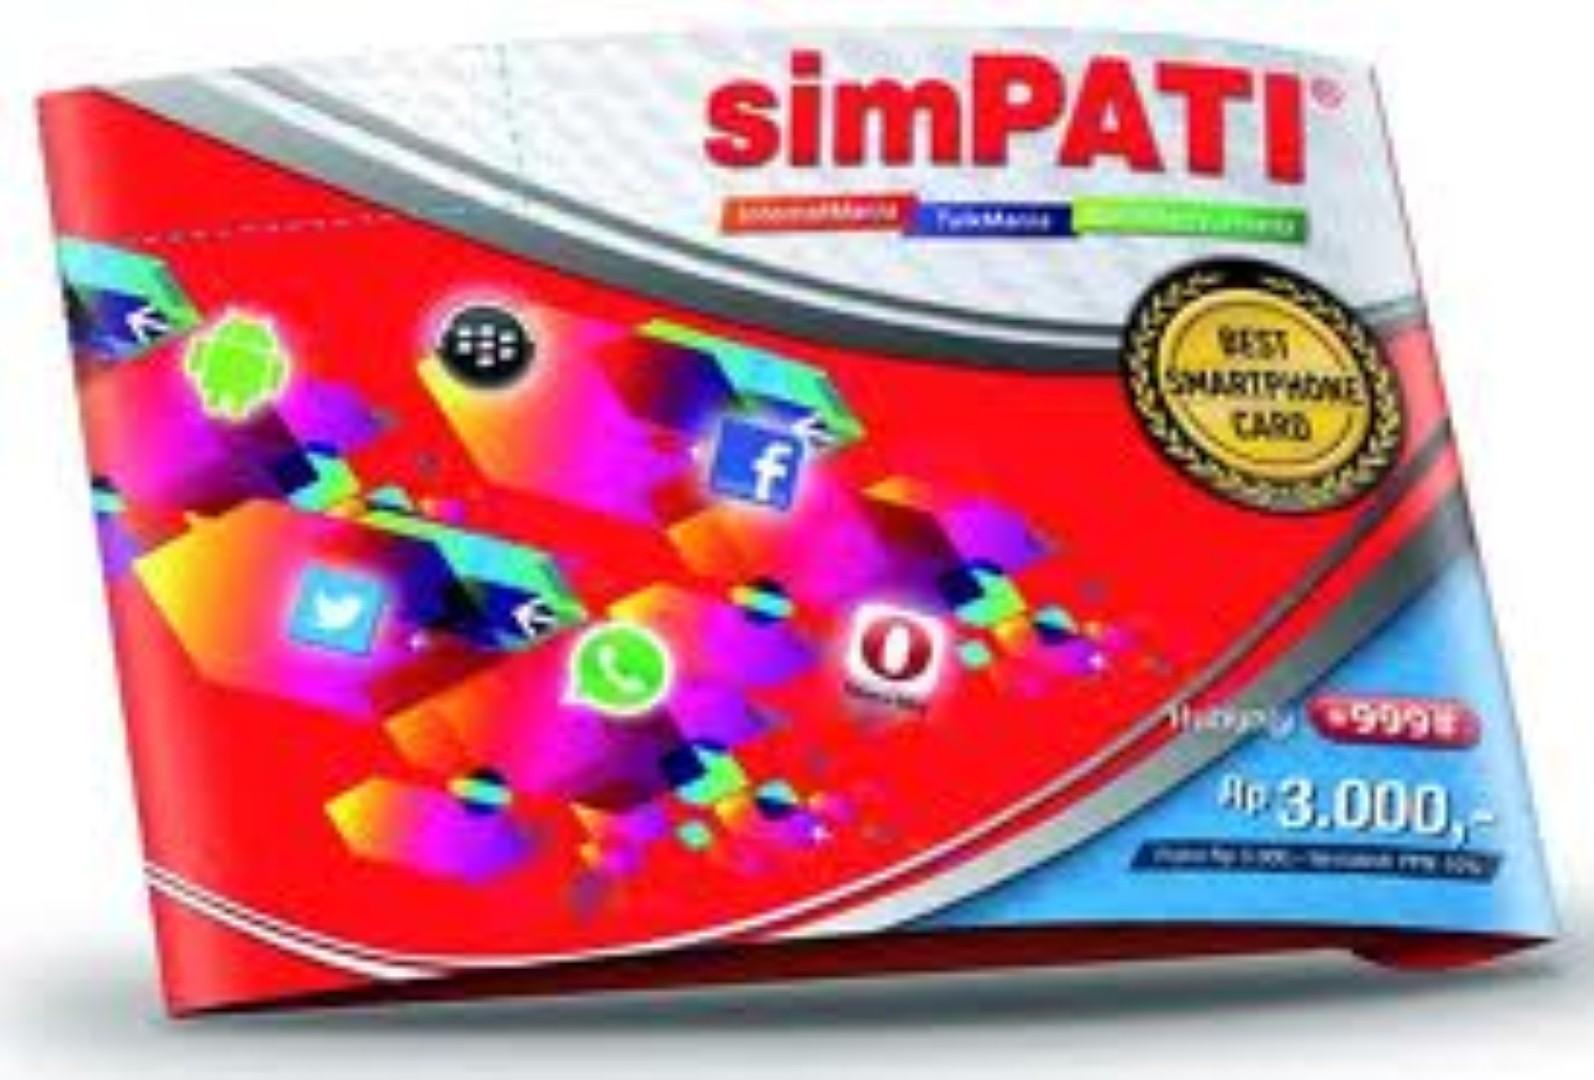 Trik Internet Gratis Simpati Up 72 Mbps Pc Meranti Komputer 12gb Telkomsel